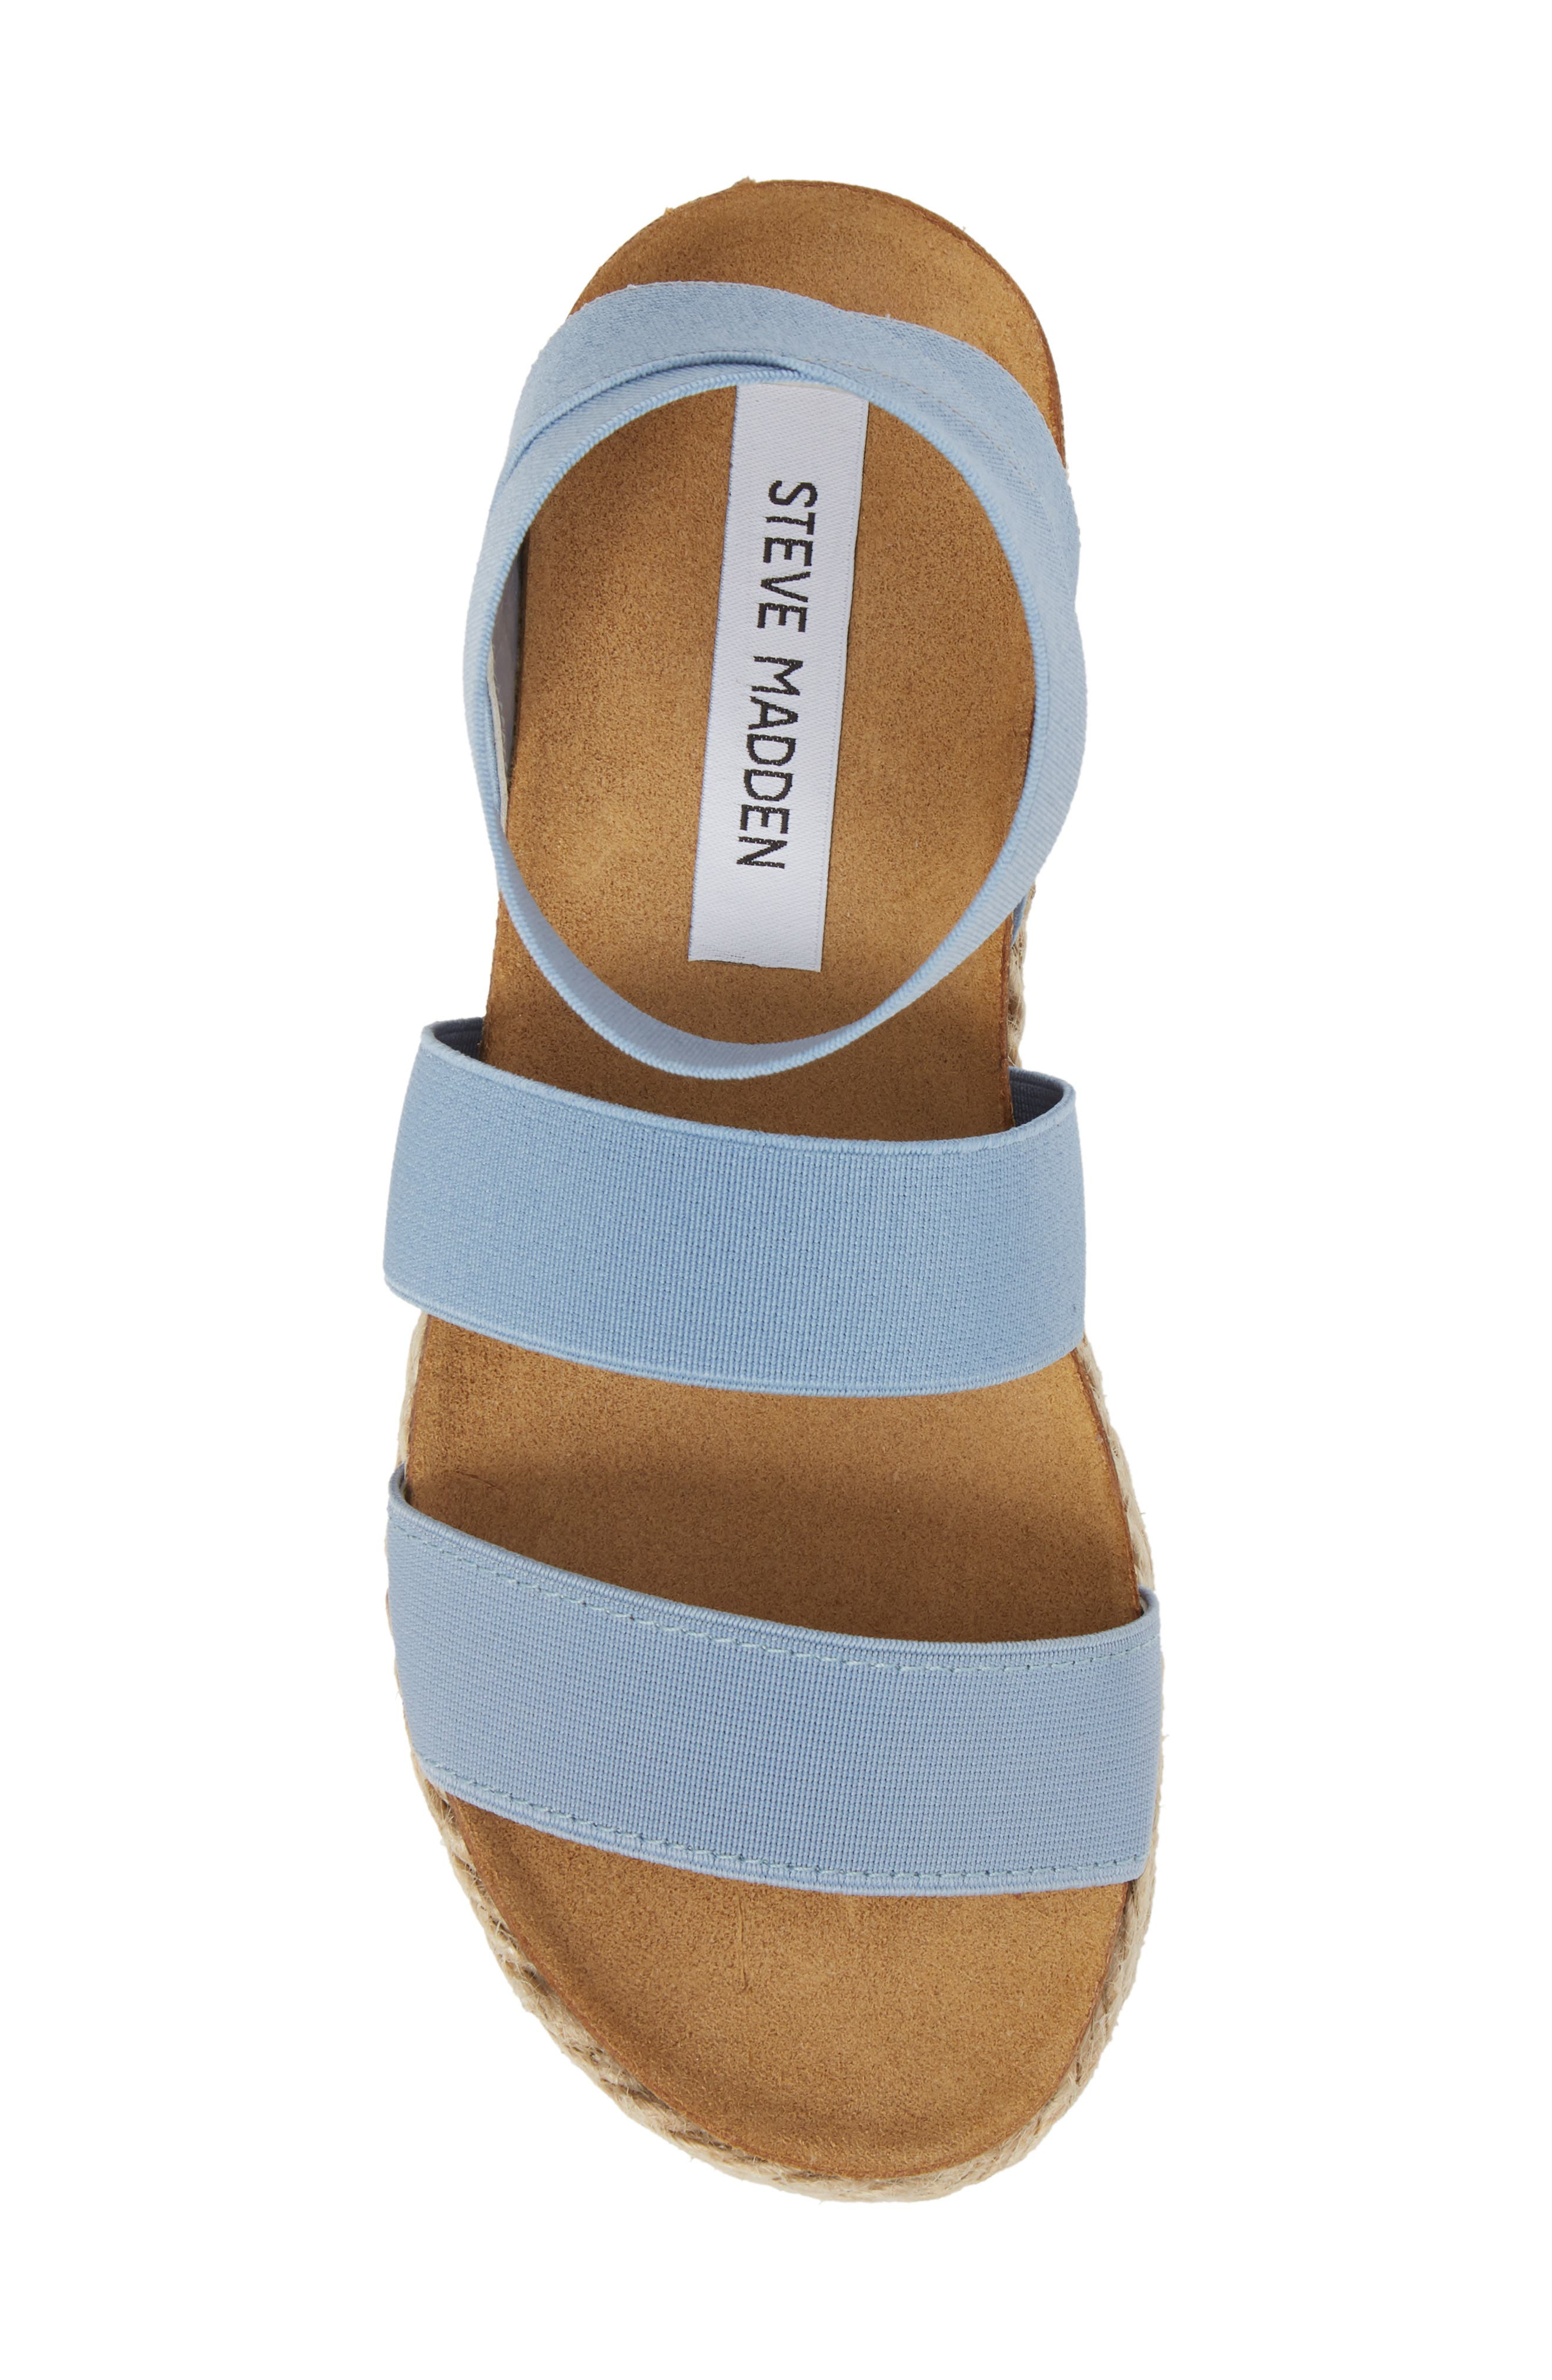 Kimmie Flatform Sandal,                             Alternate thumbnail 5, color,                             Blue